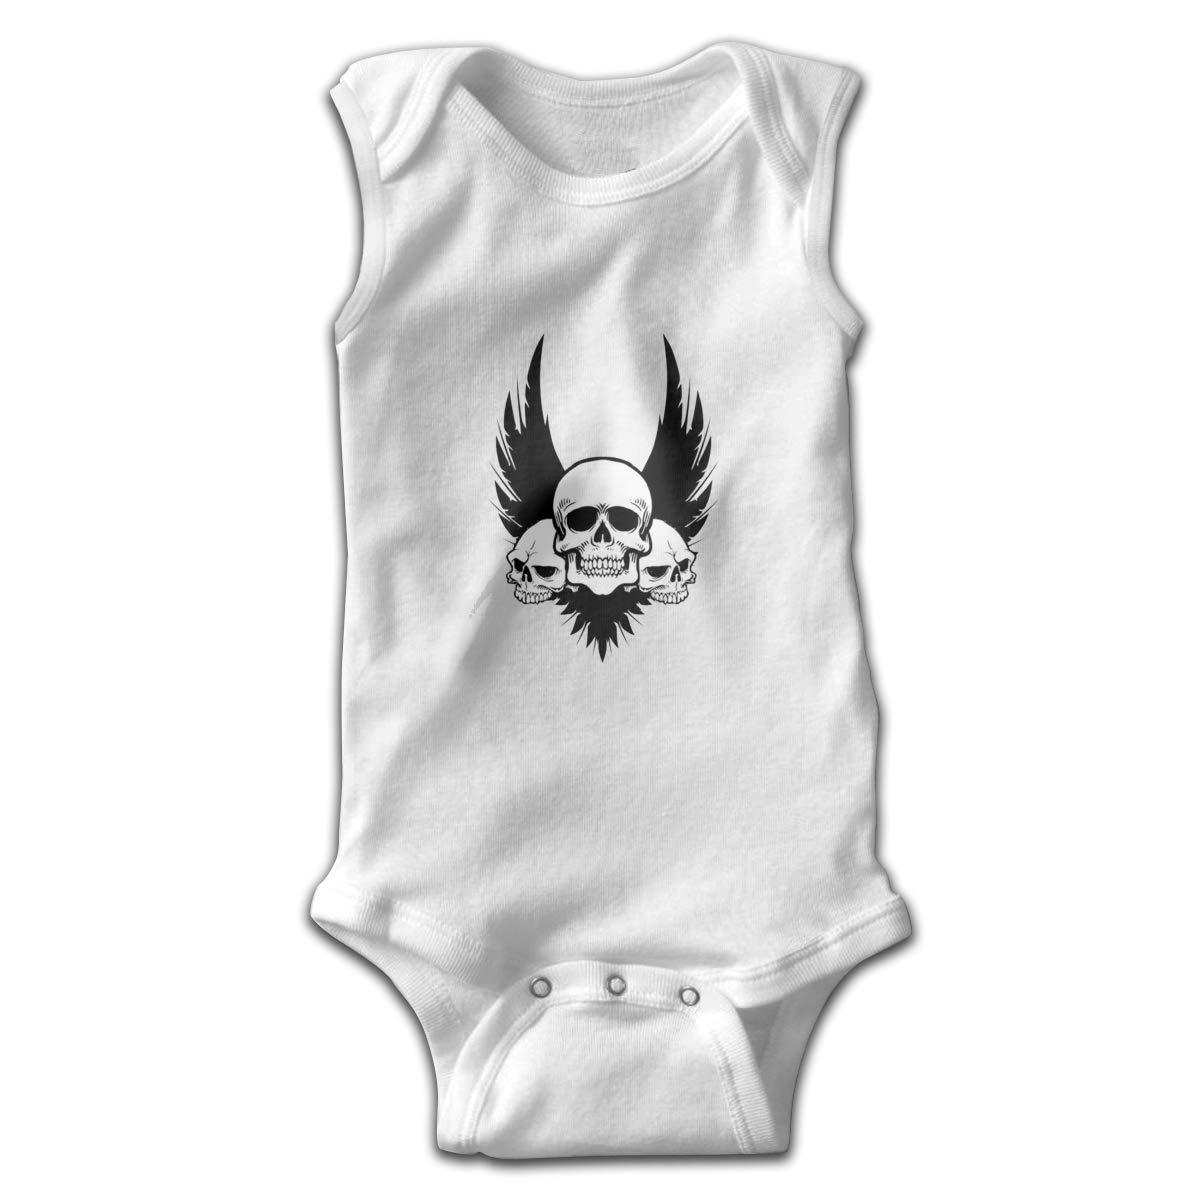 Dfenere Skull Newborn Baby No Sleeve Bodysuit Romper Infant Summer Clothing White